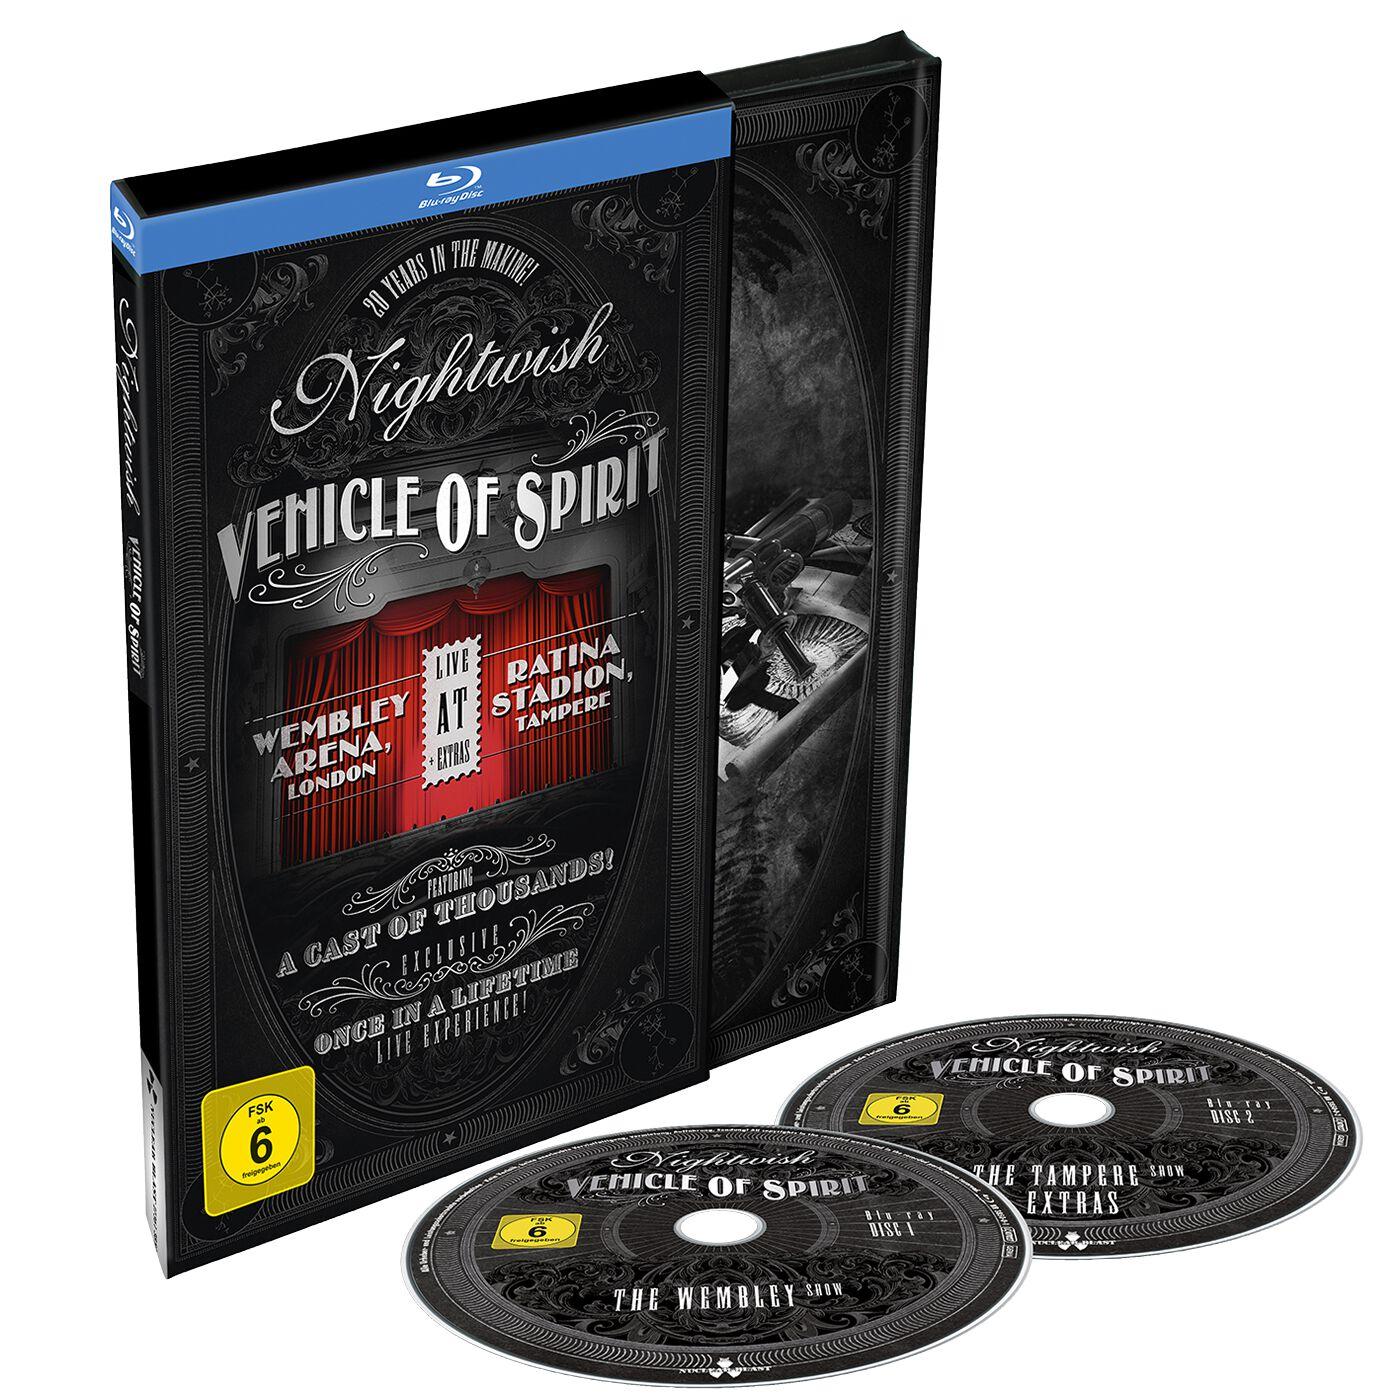 Image of Nightwish Vehicle Of Spirit 2-Blu-ray Standard